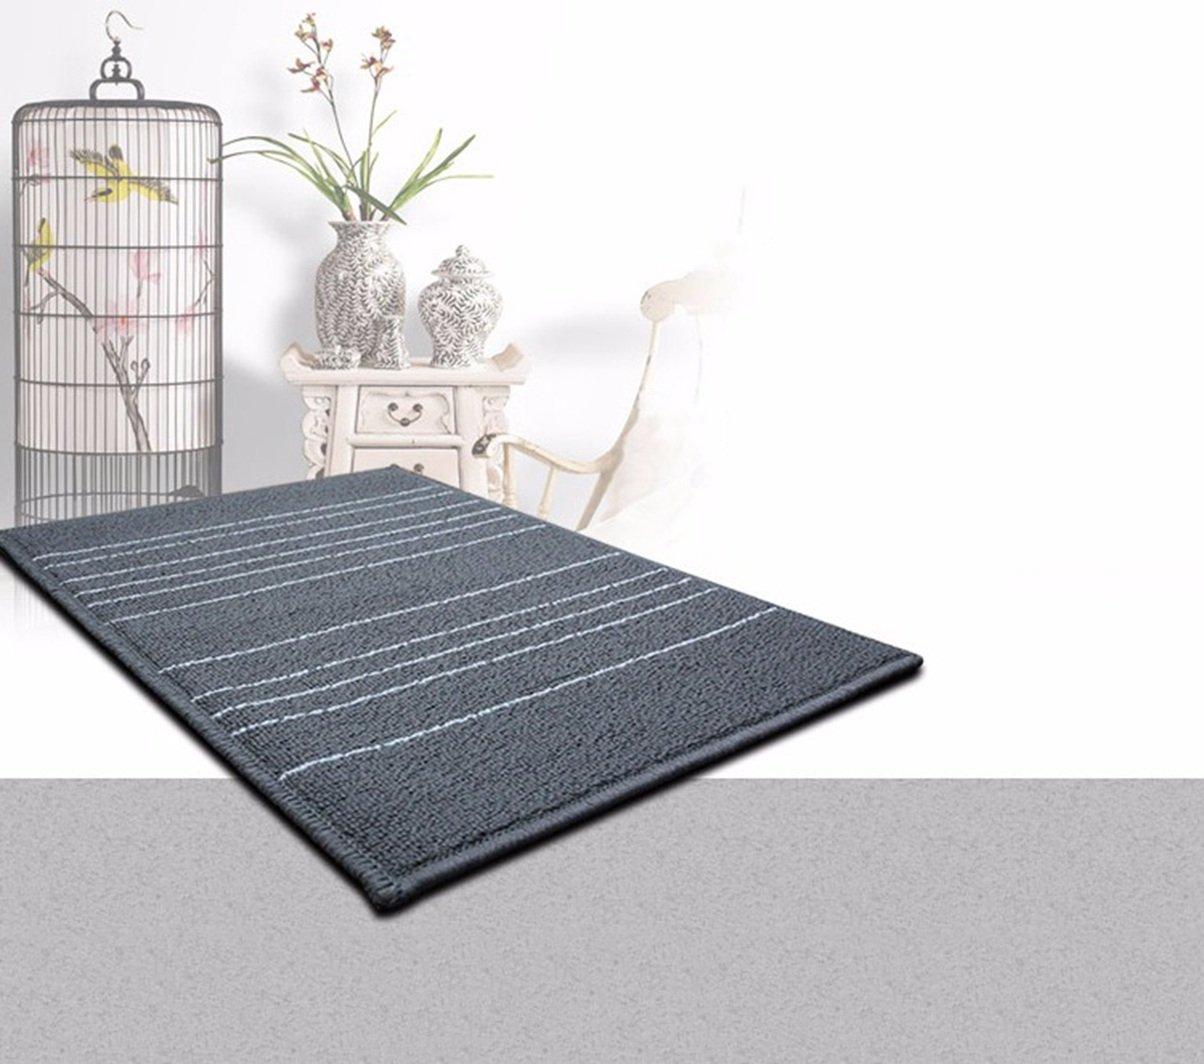 JCRNJSB® シンプルな黒と白の縞模様のカーペットソファカーペットベッドサイドベッドカーペットリビングルームのコーヒーテーブルマット長方形大型カーペット ノンスリップ、環境保護   B078HSCYJC